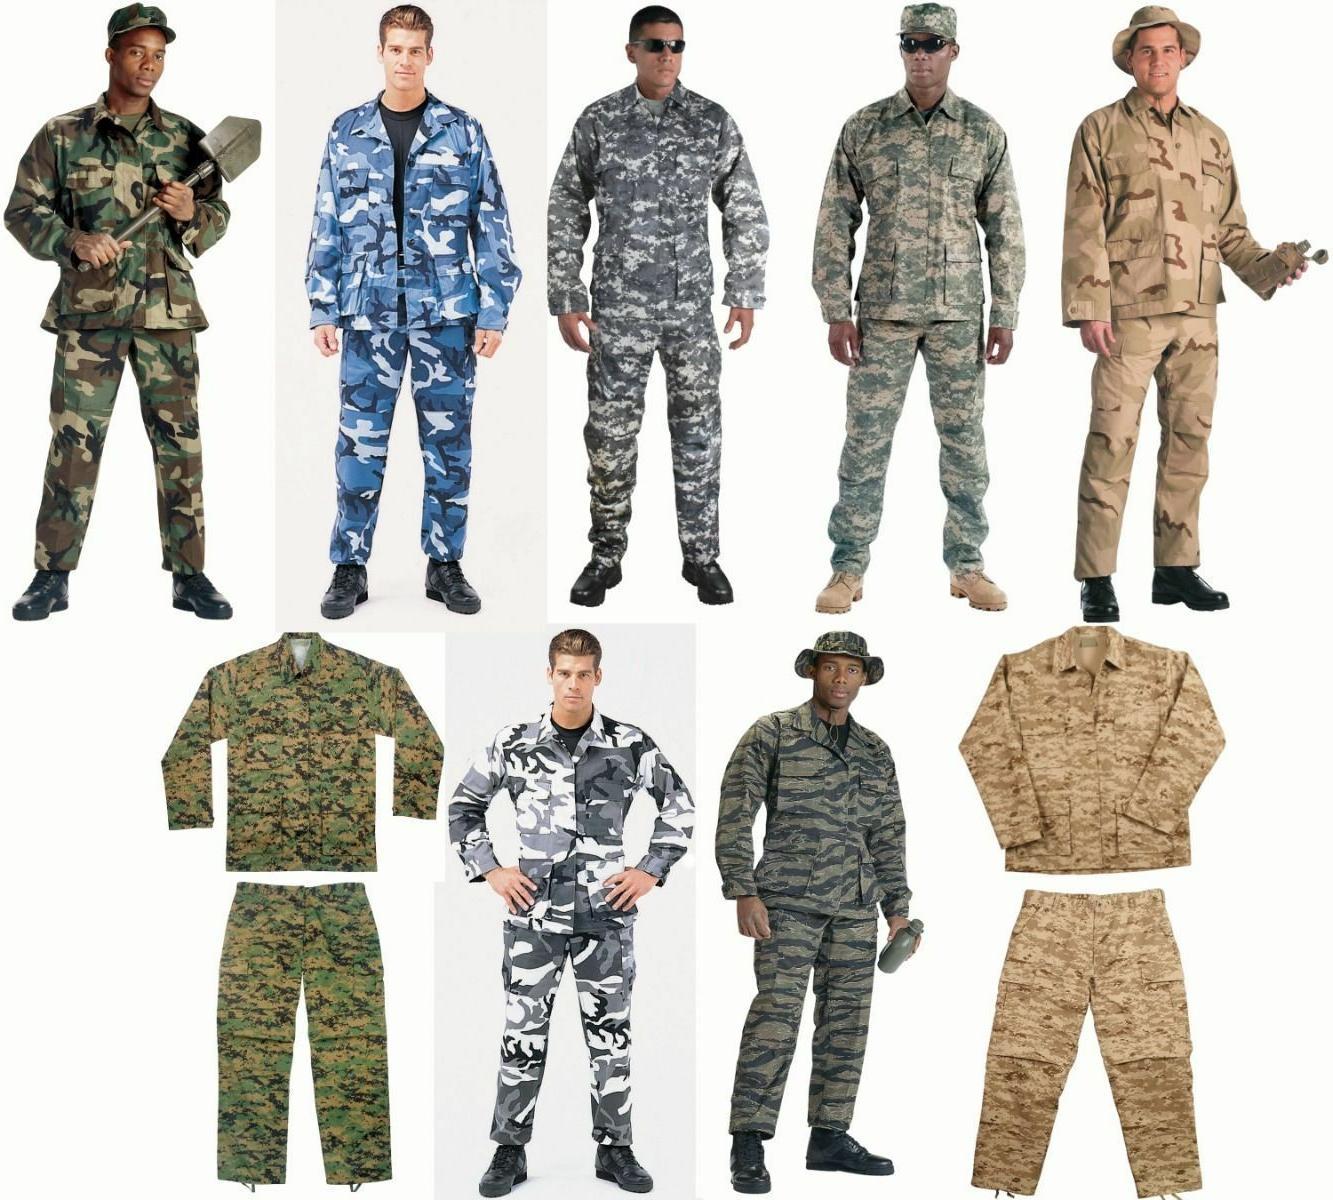 BDU SALE! Military Camo Digital BDU Tactical Cargo Uniforms